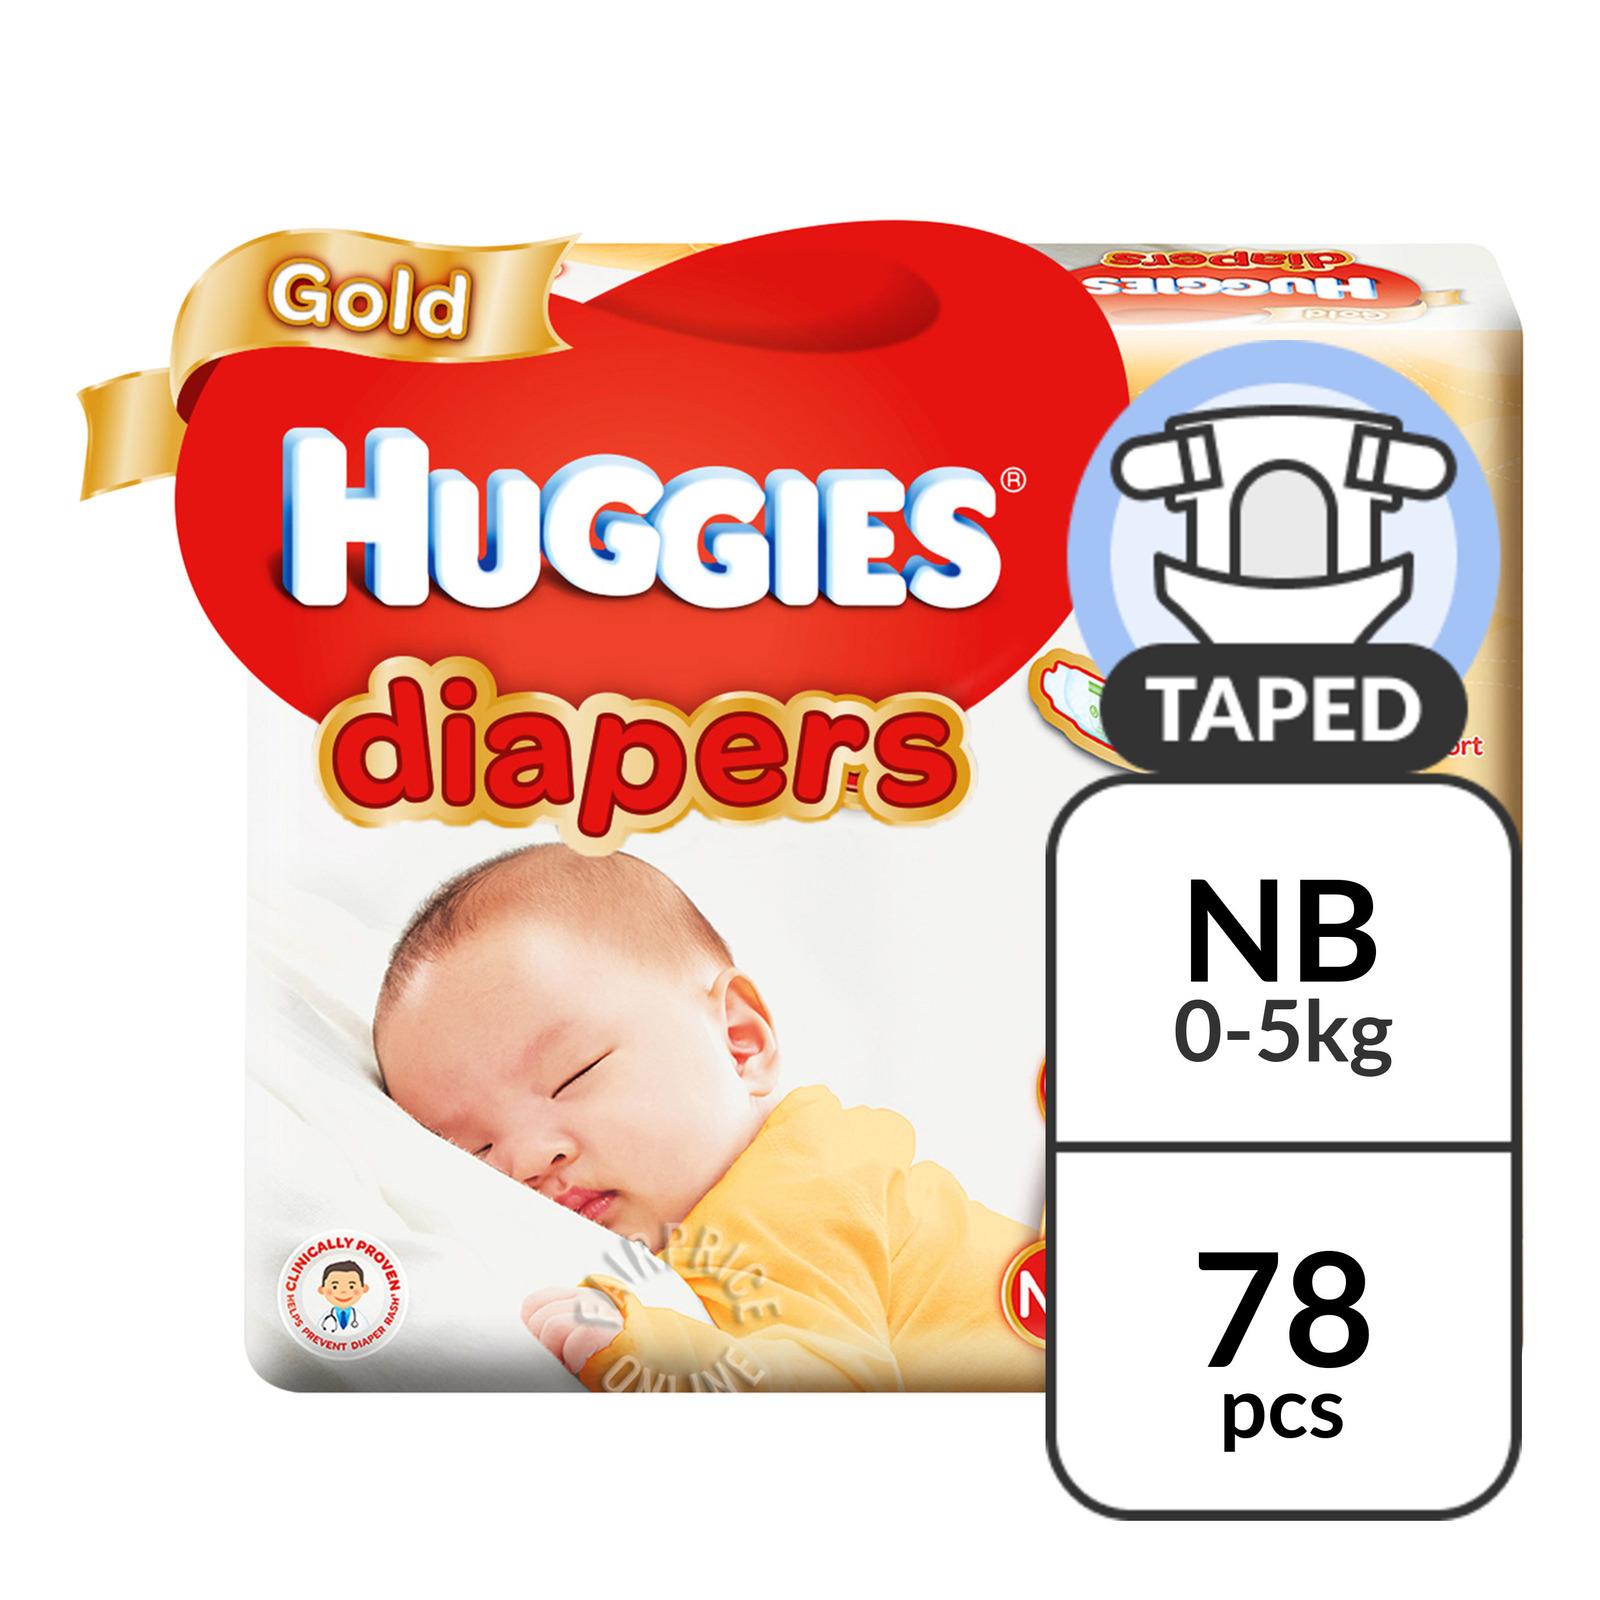 Huggies Gold Diapers - New Born (0 - 5kg)